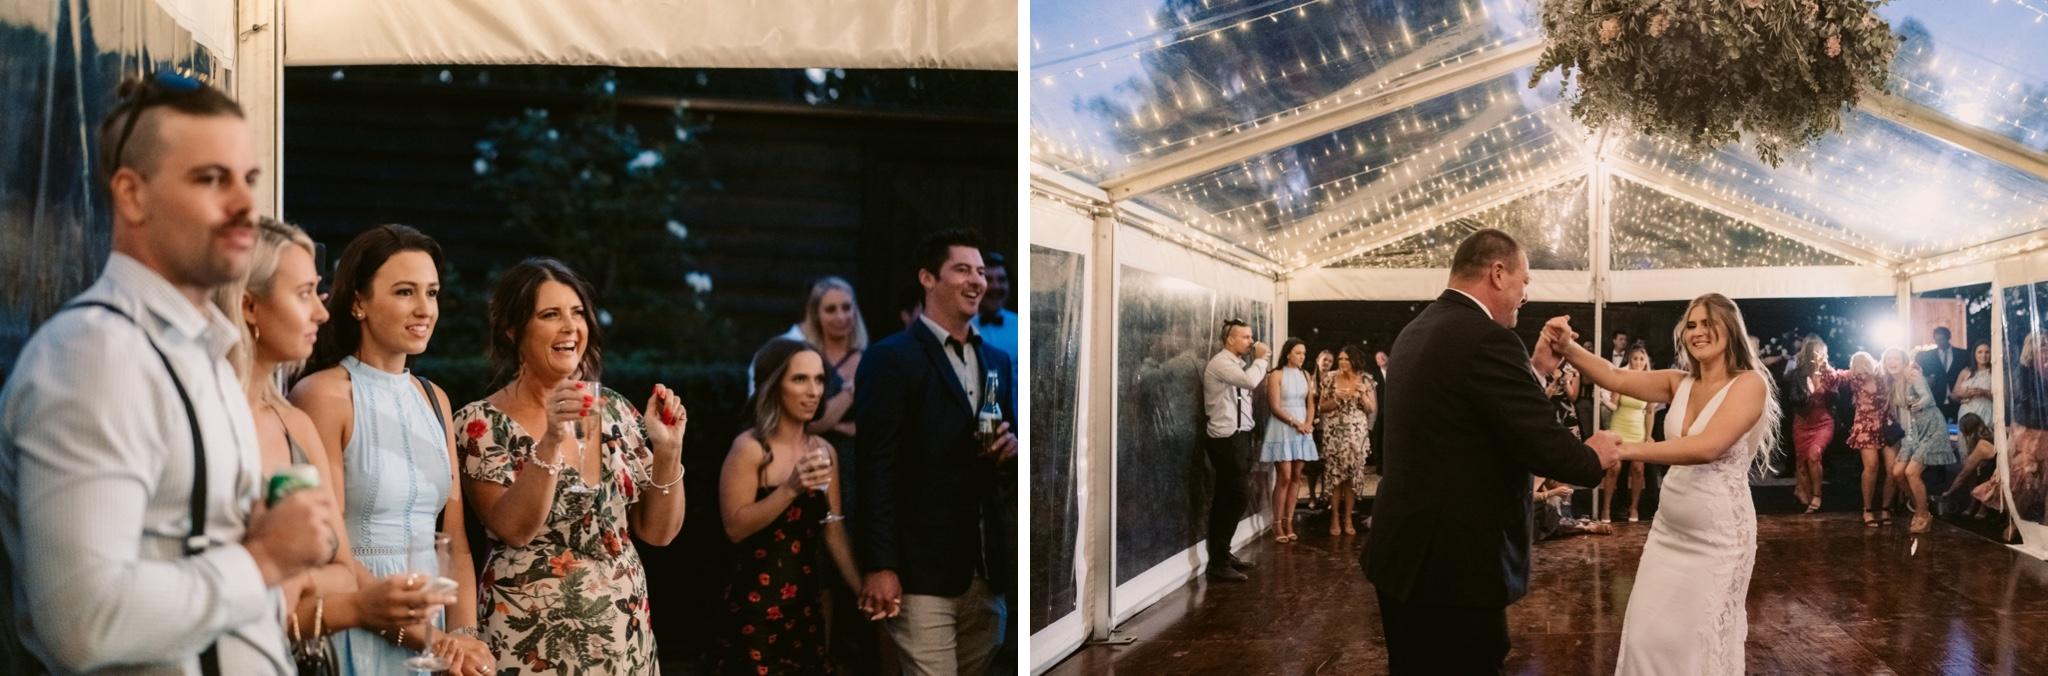 Mornington Peninsula Wedding Photography95.jpg